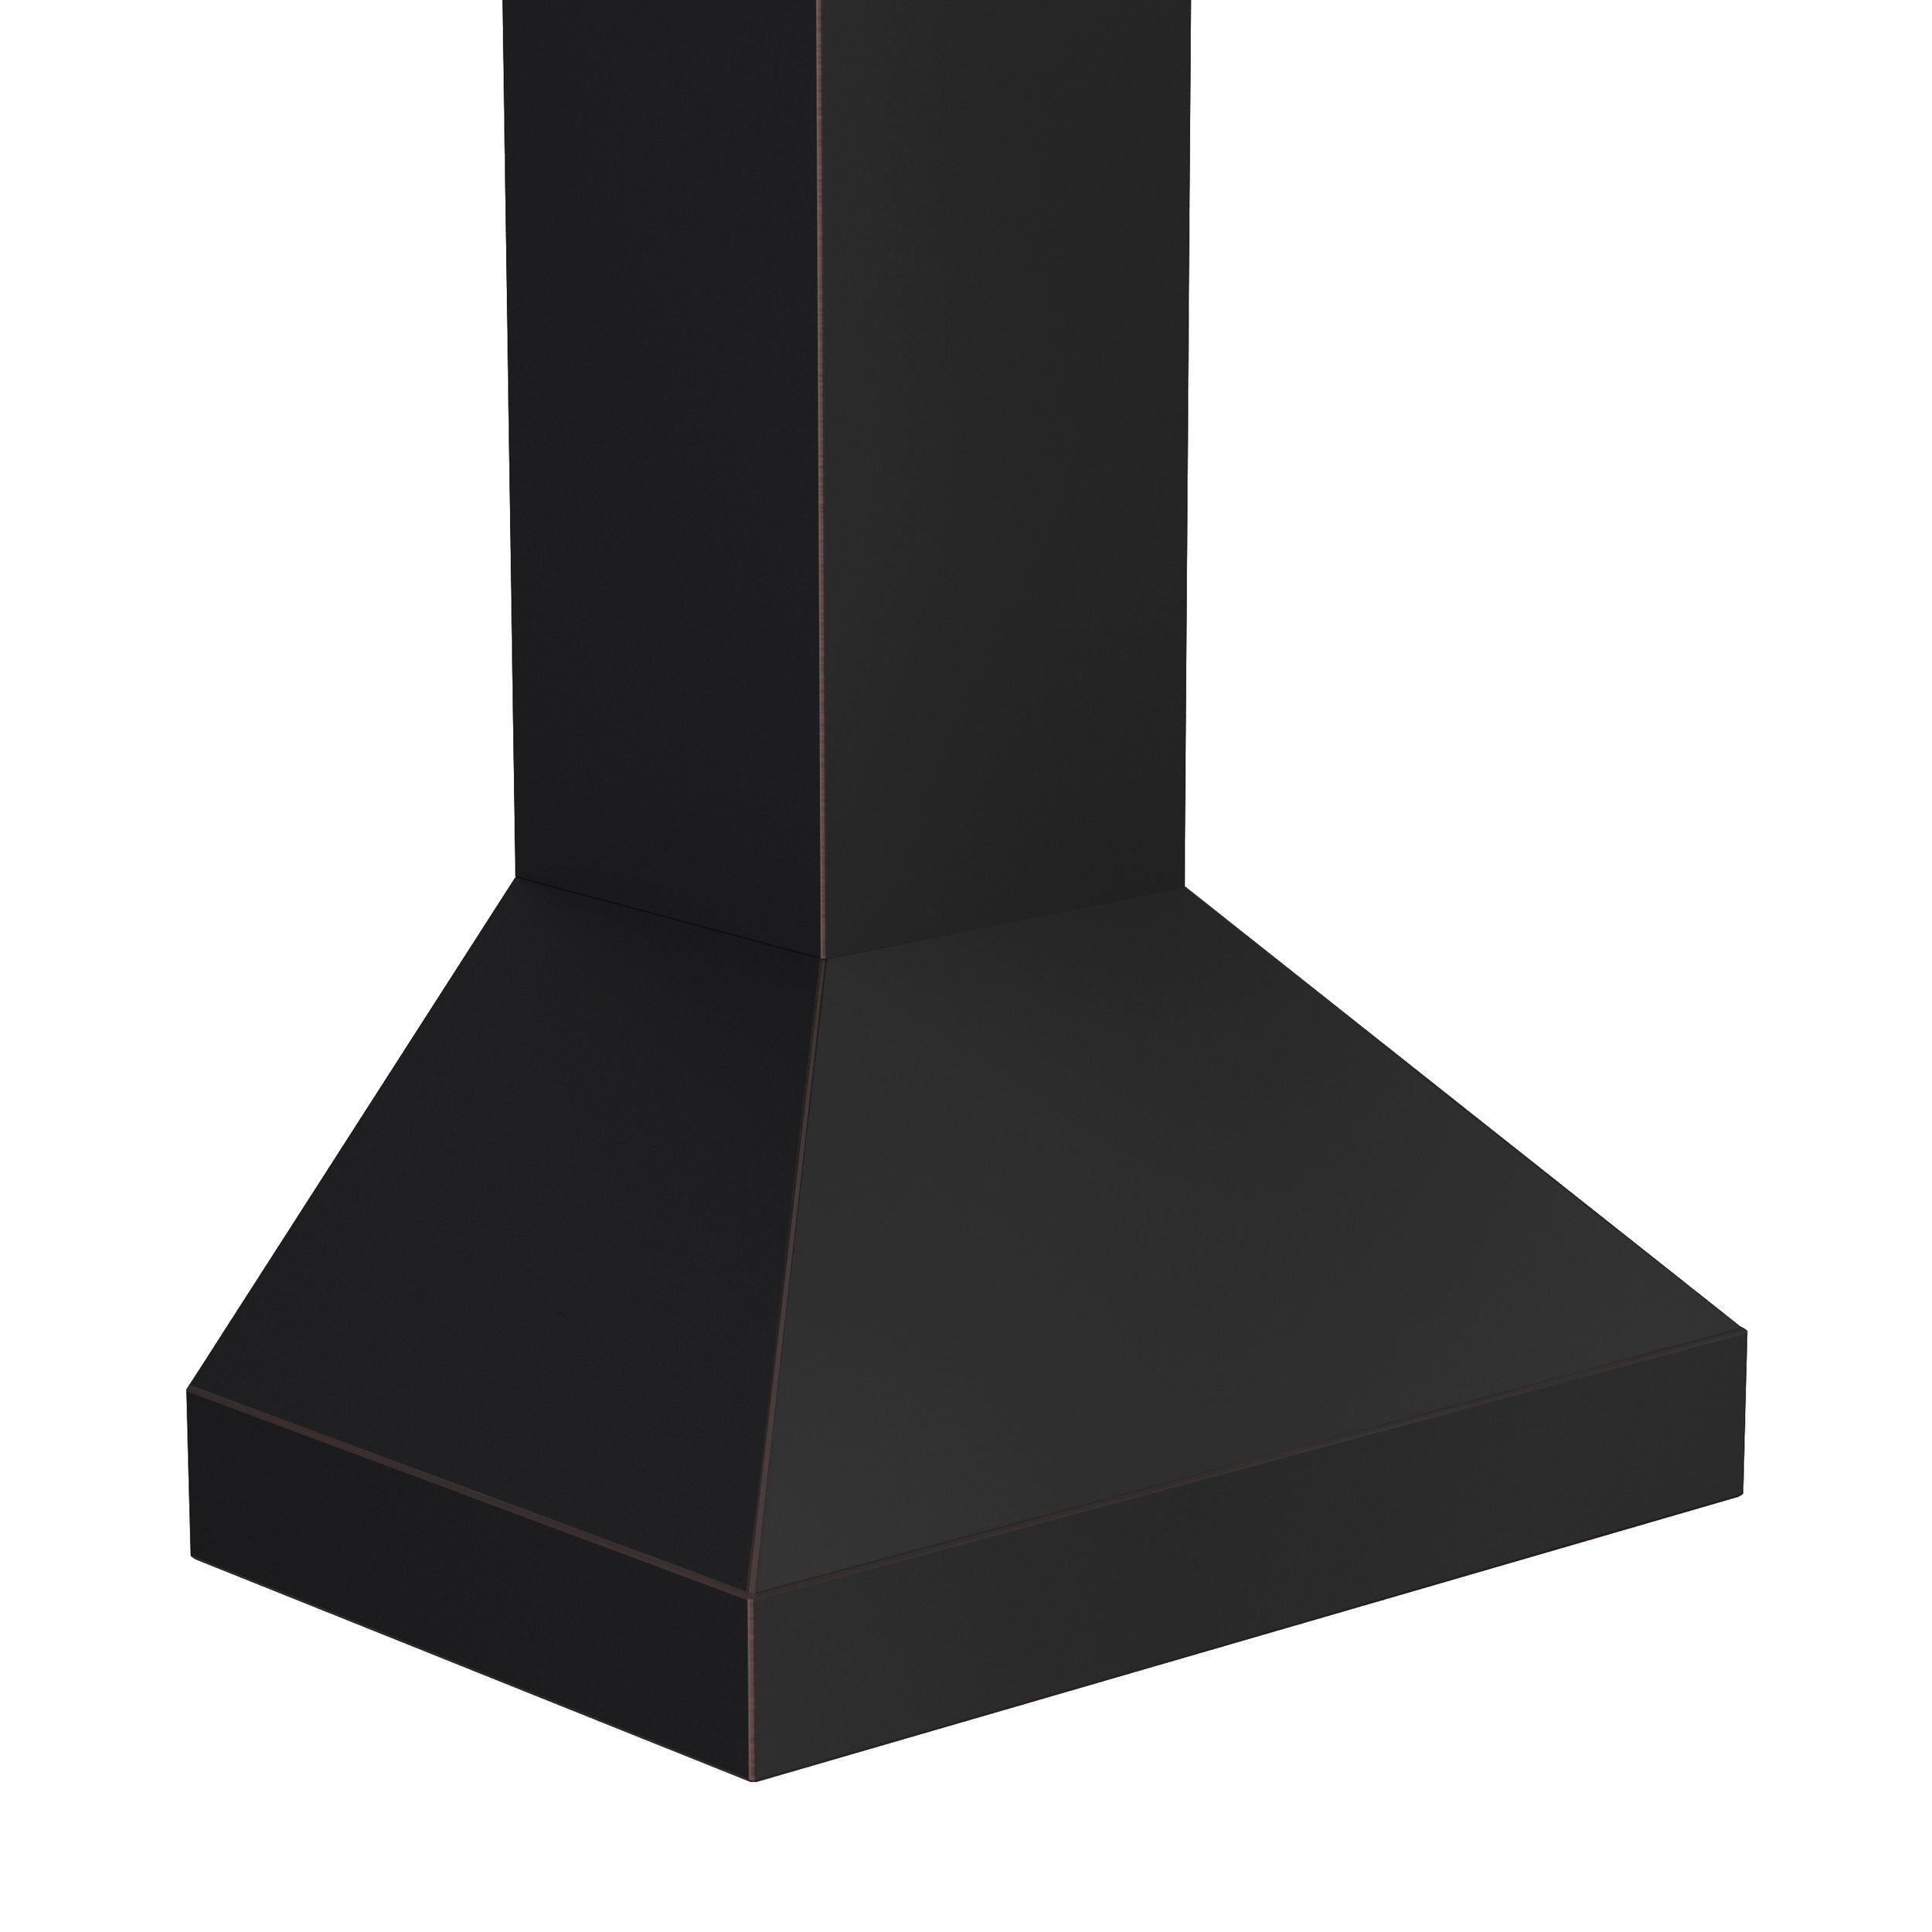 zline-copper-wall-mounted-range-hood-8667B-top.jpg